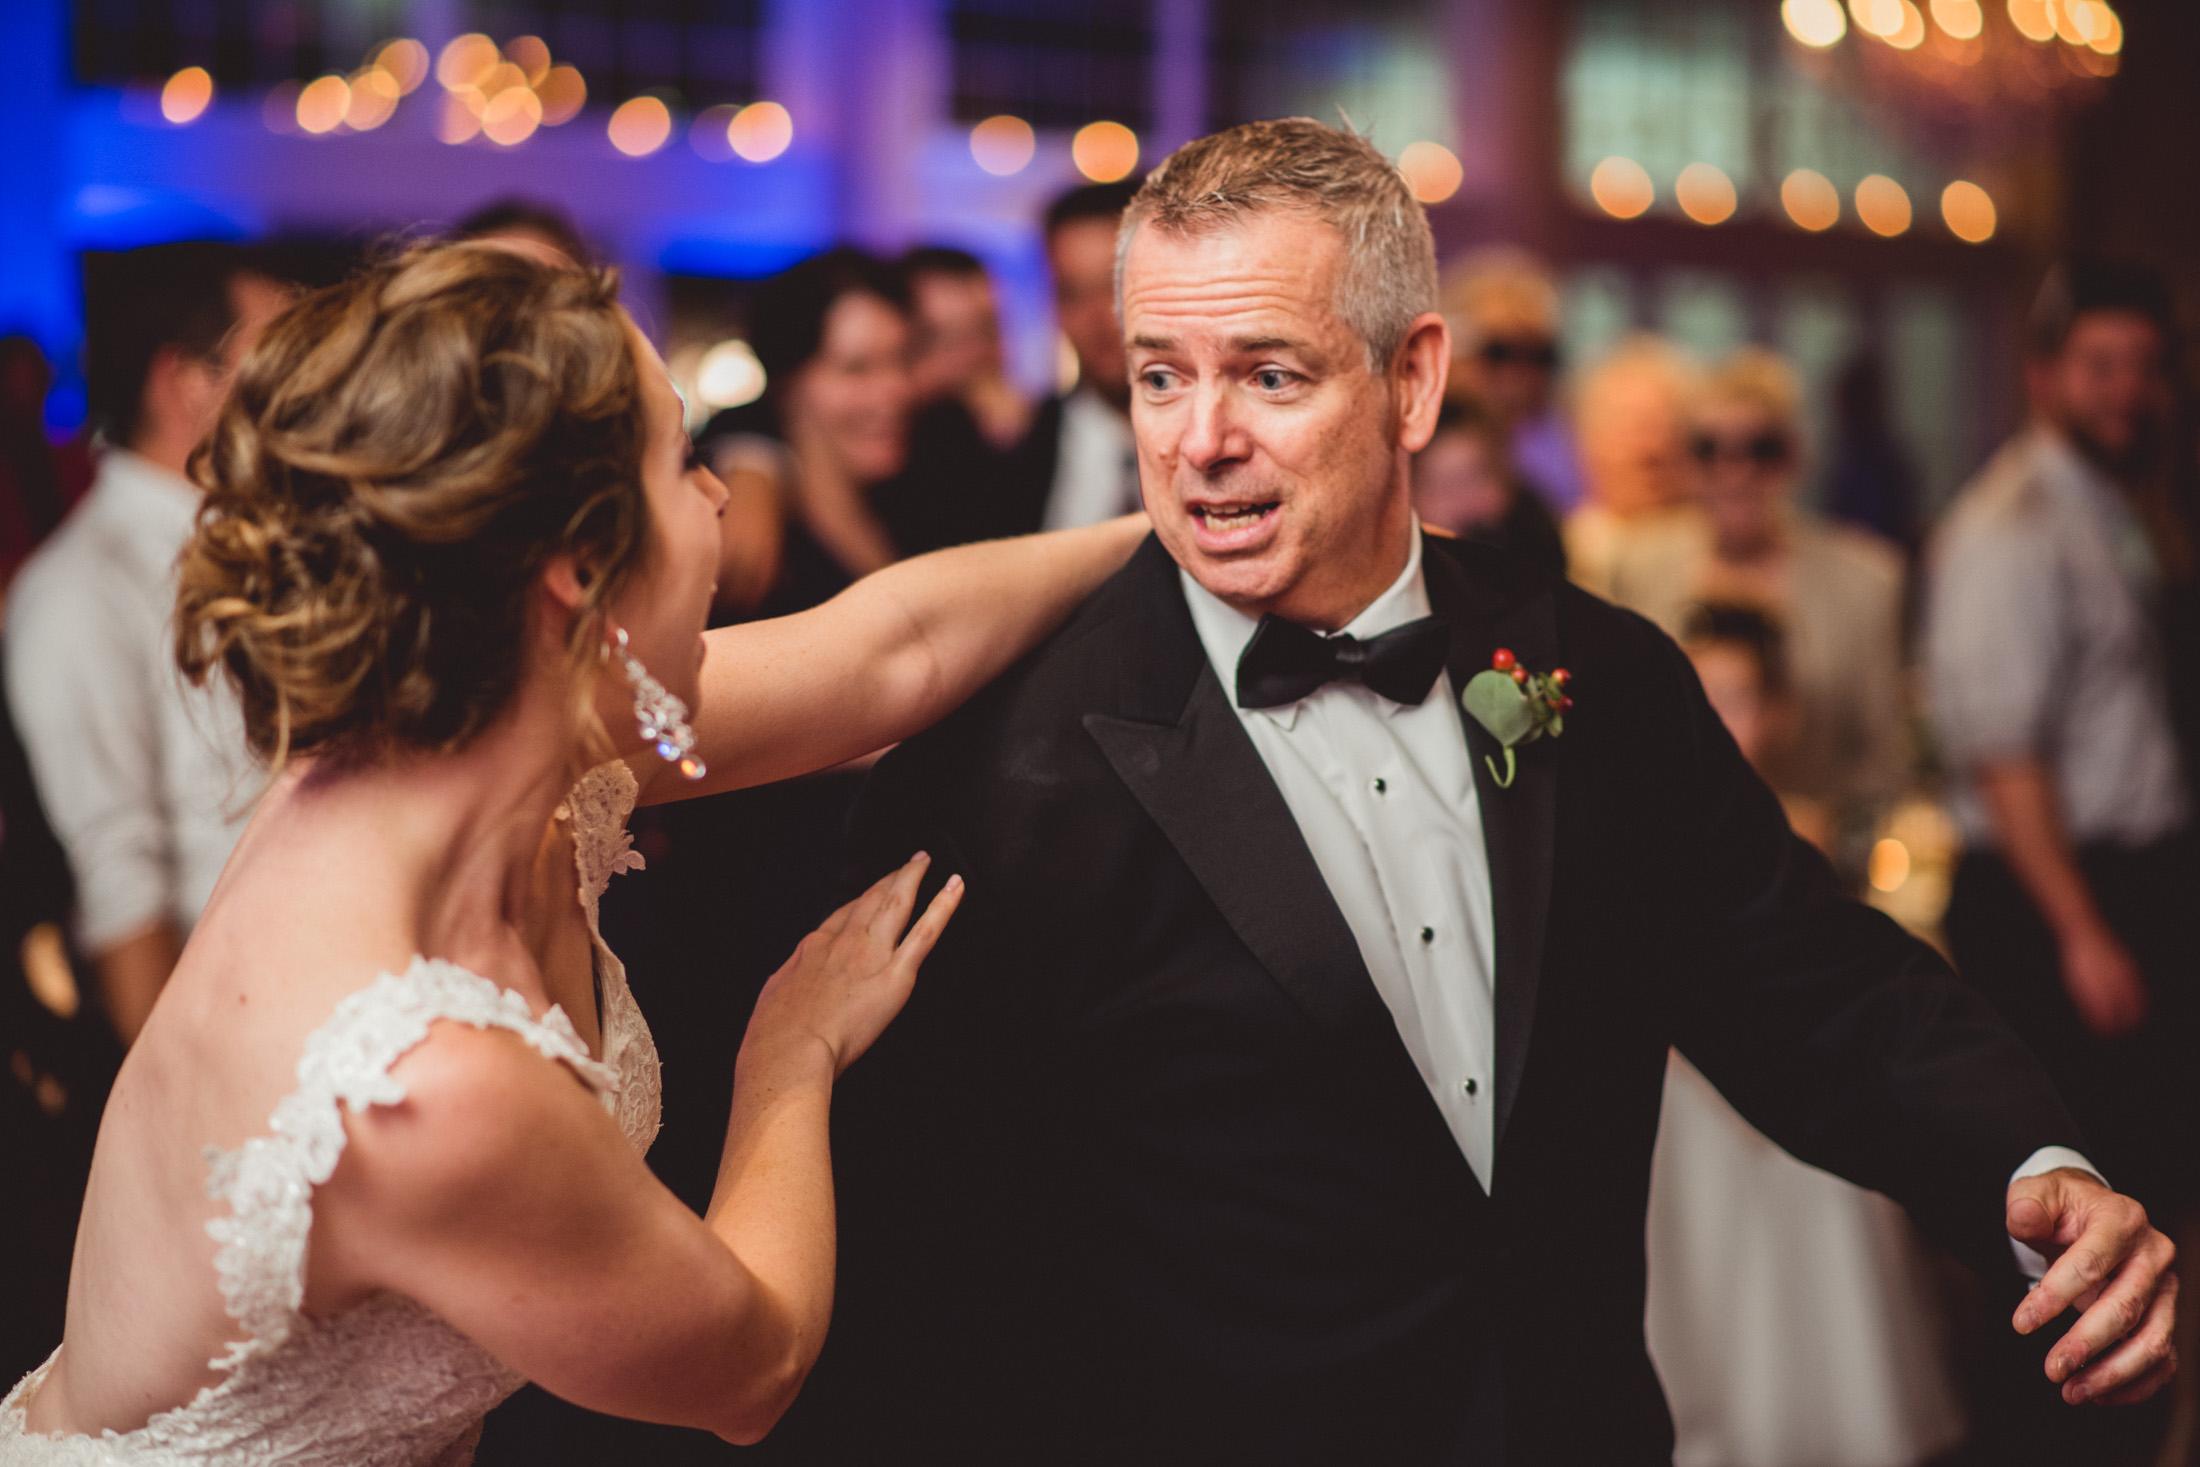 Cruiseport-Wedding-Photographer-47.jpg